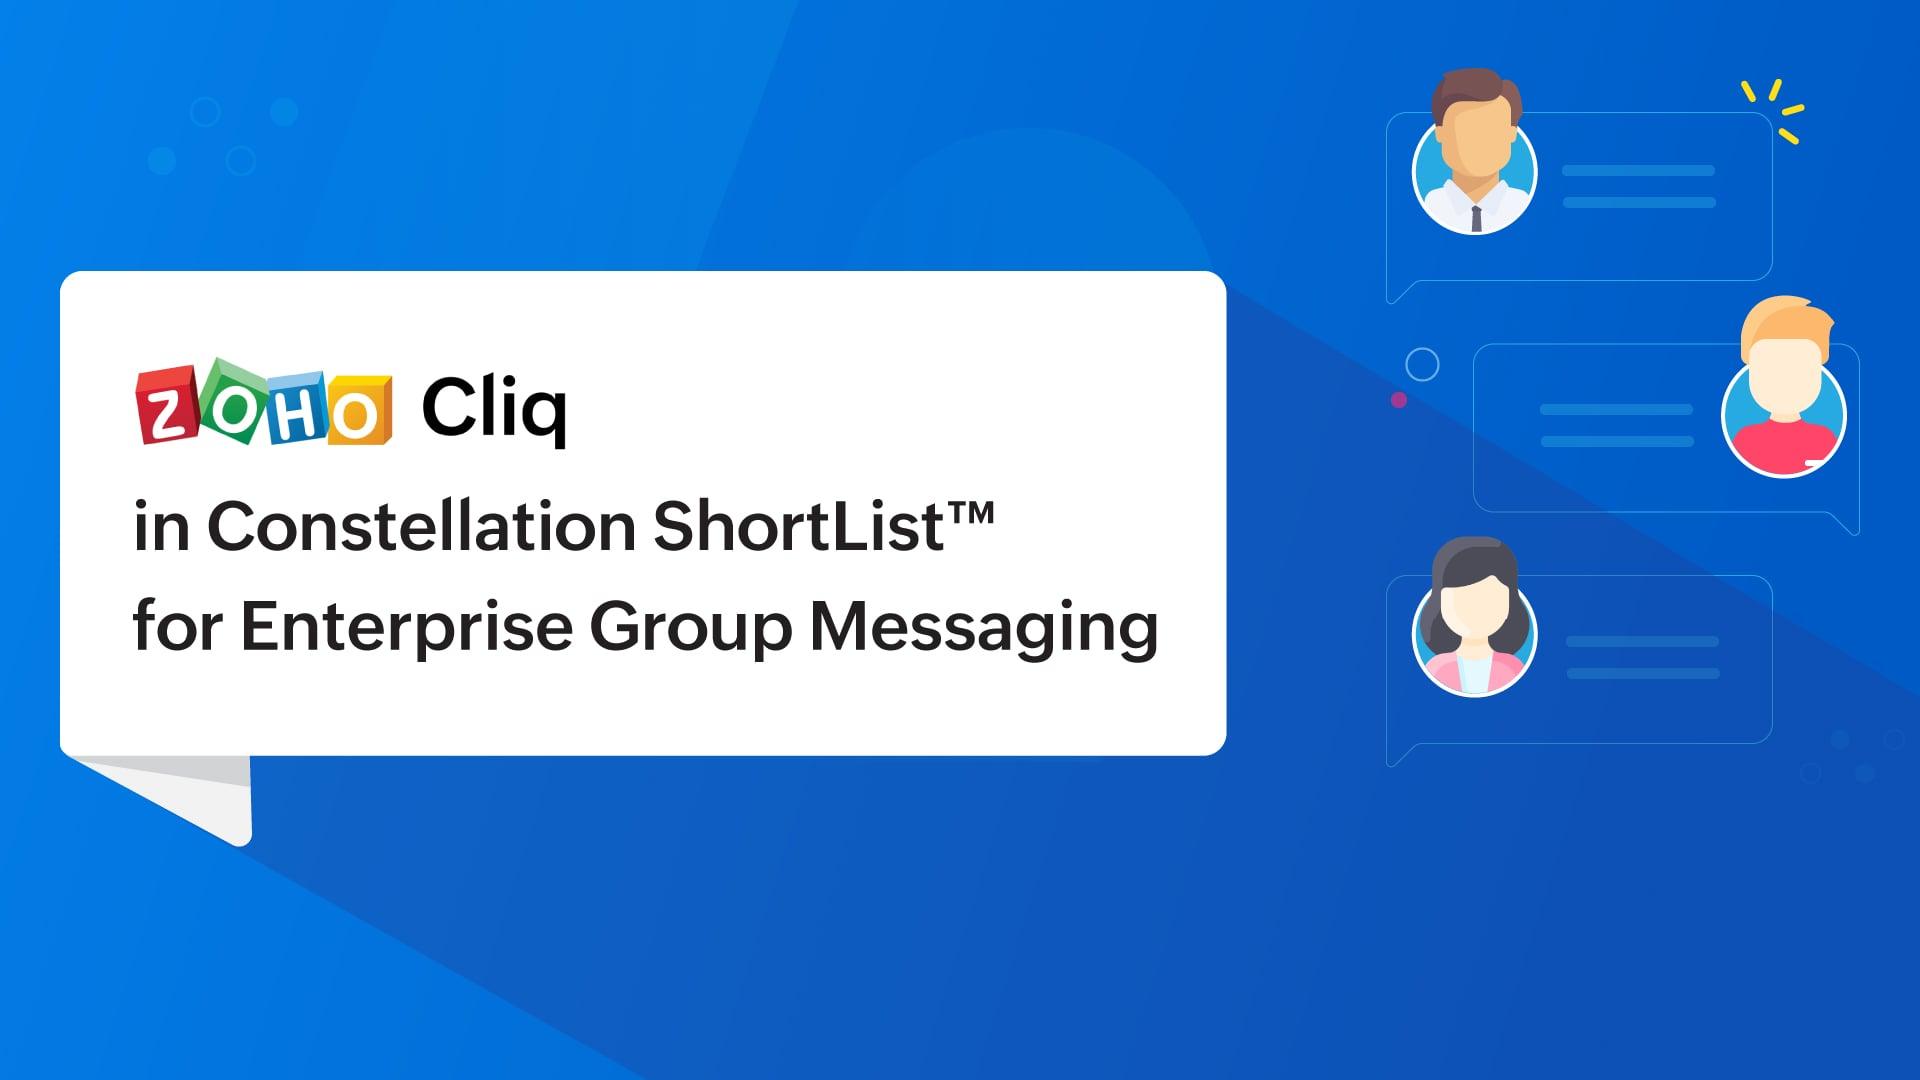 Zoho Cliq recognized in Constellation ShortList™